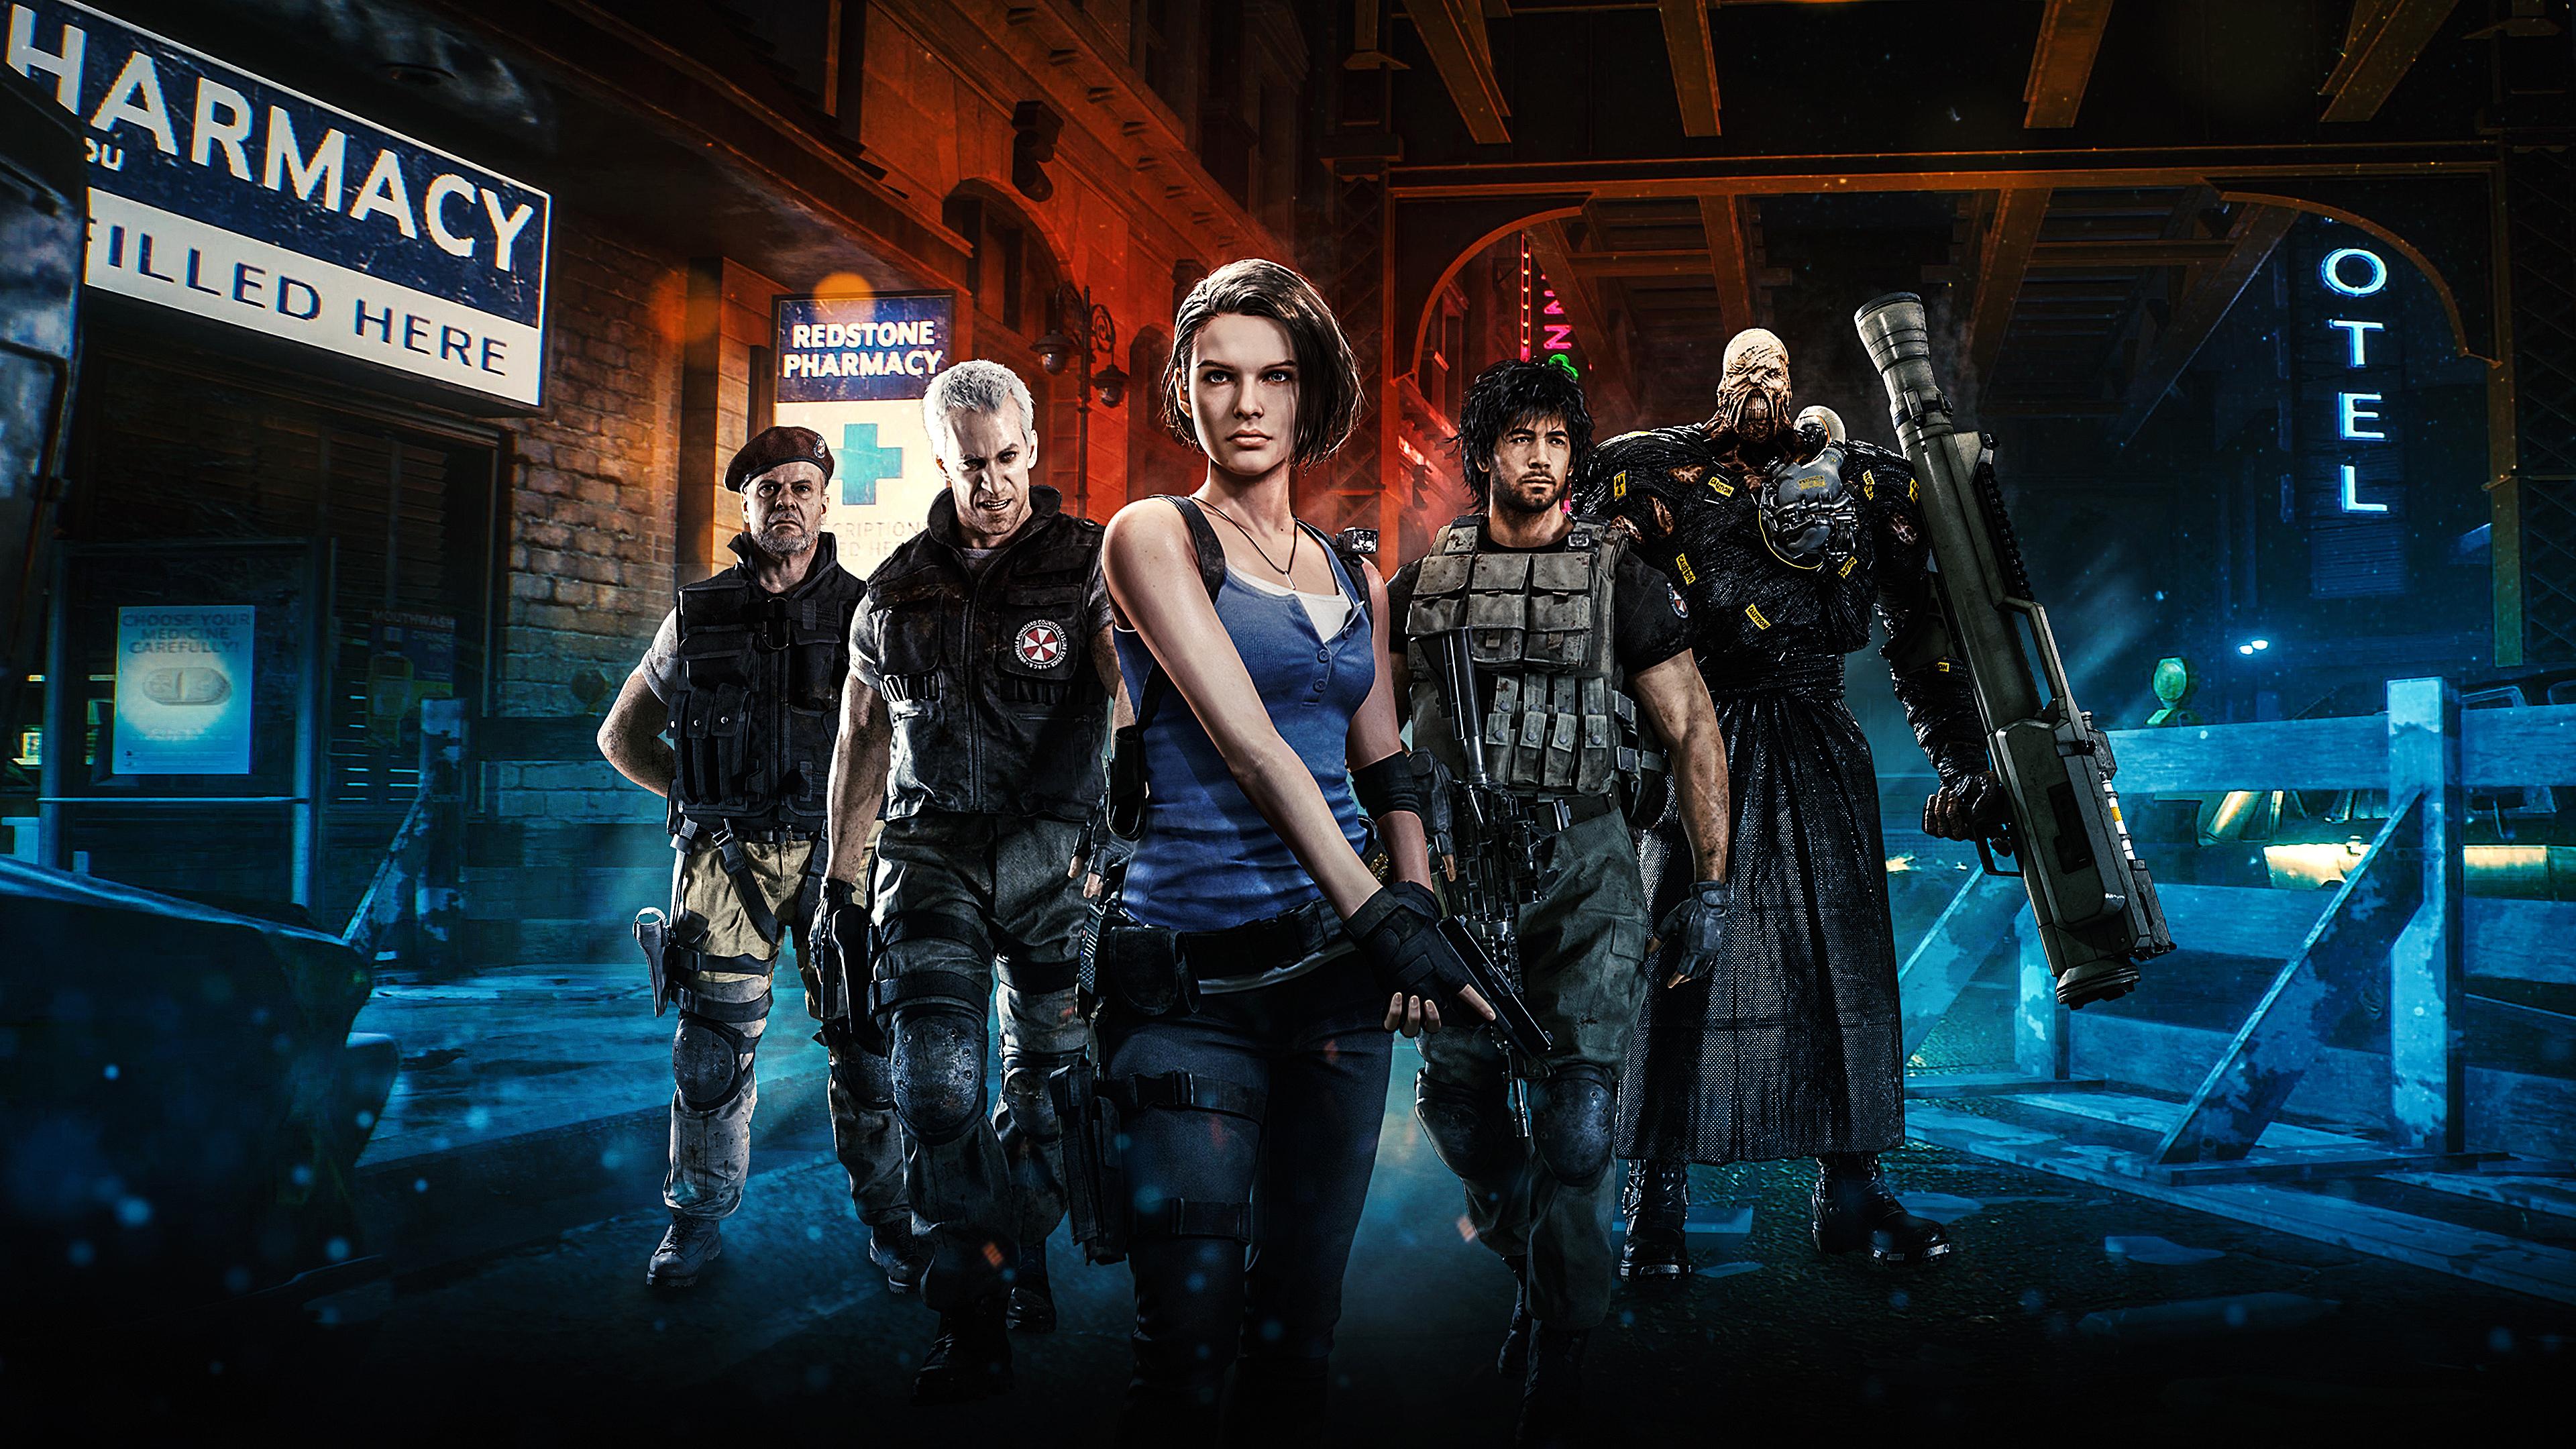 Resident Evil 3 2020 Remake Wallpaper Hd Games 4k Wallpapers